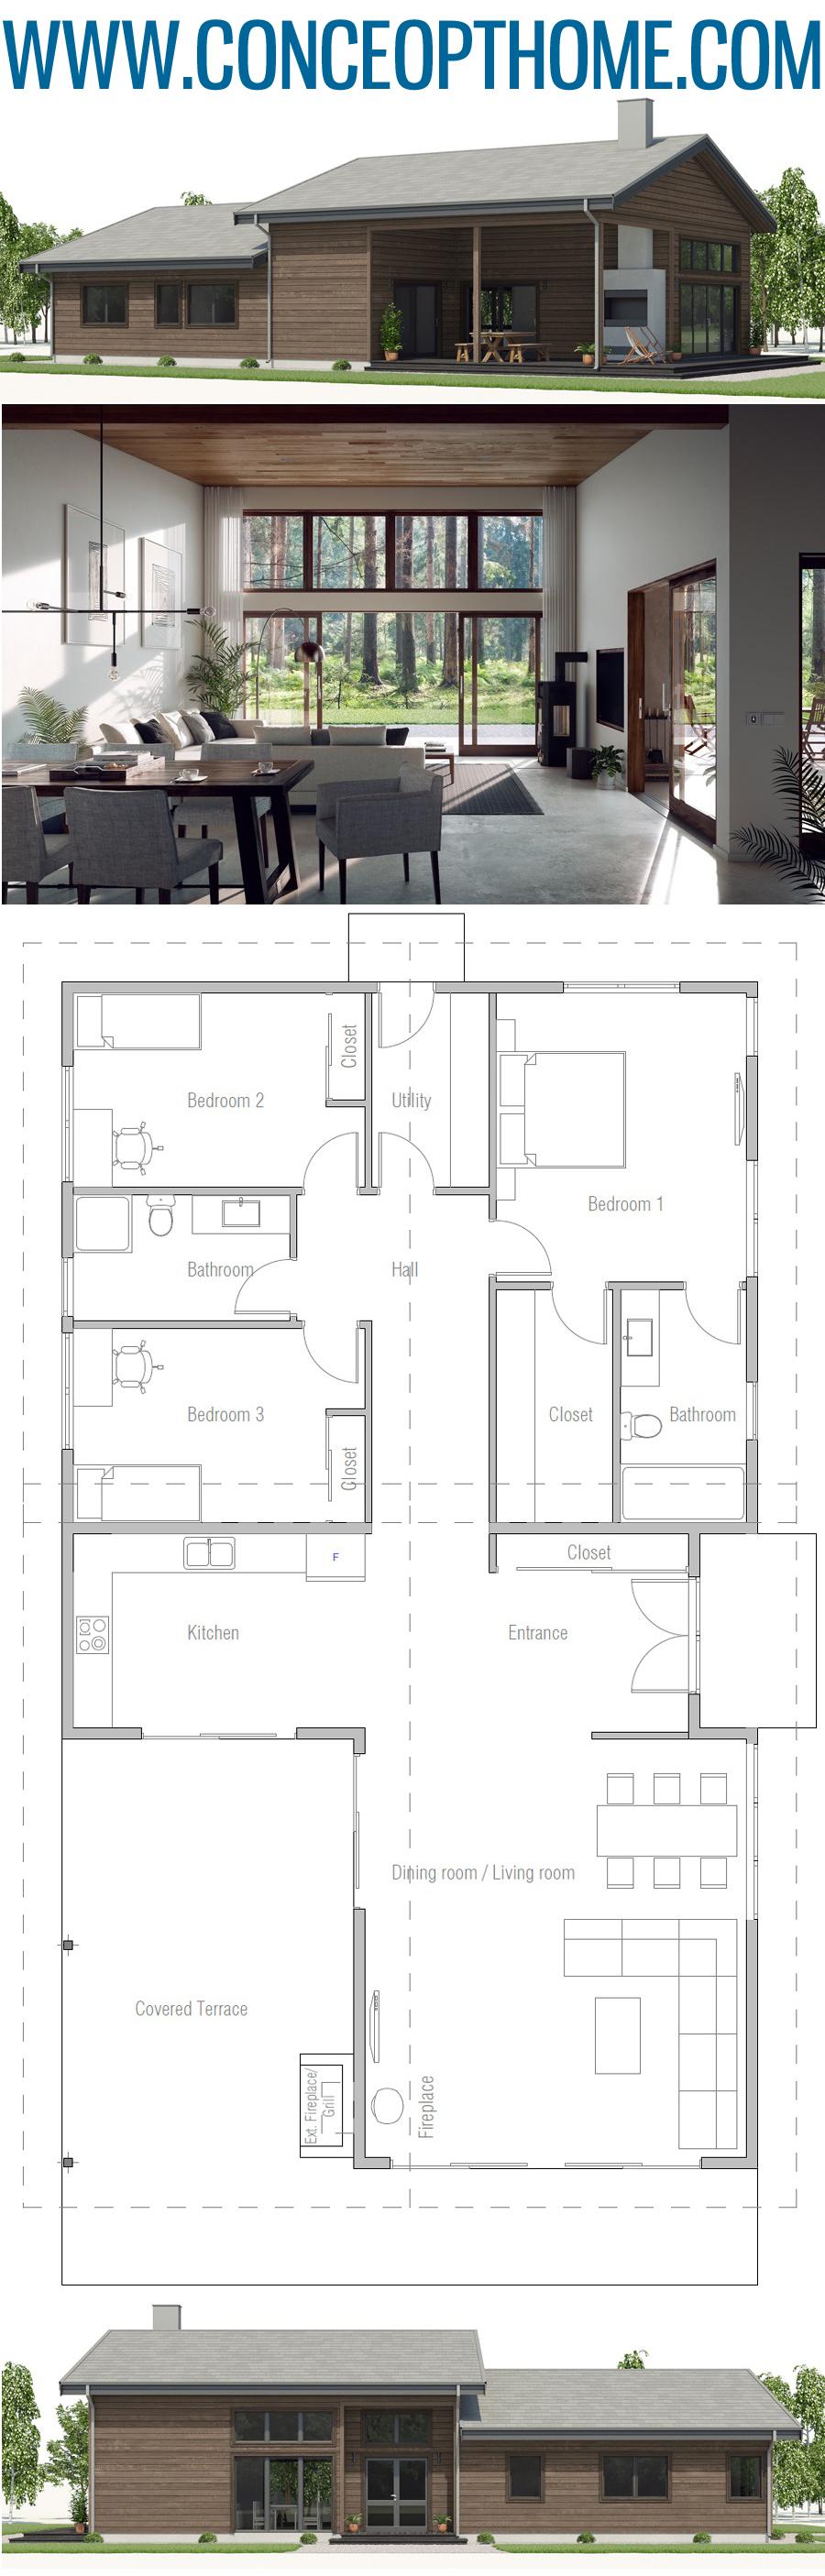 ConceptHome Architecture #strandhuis